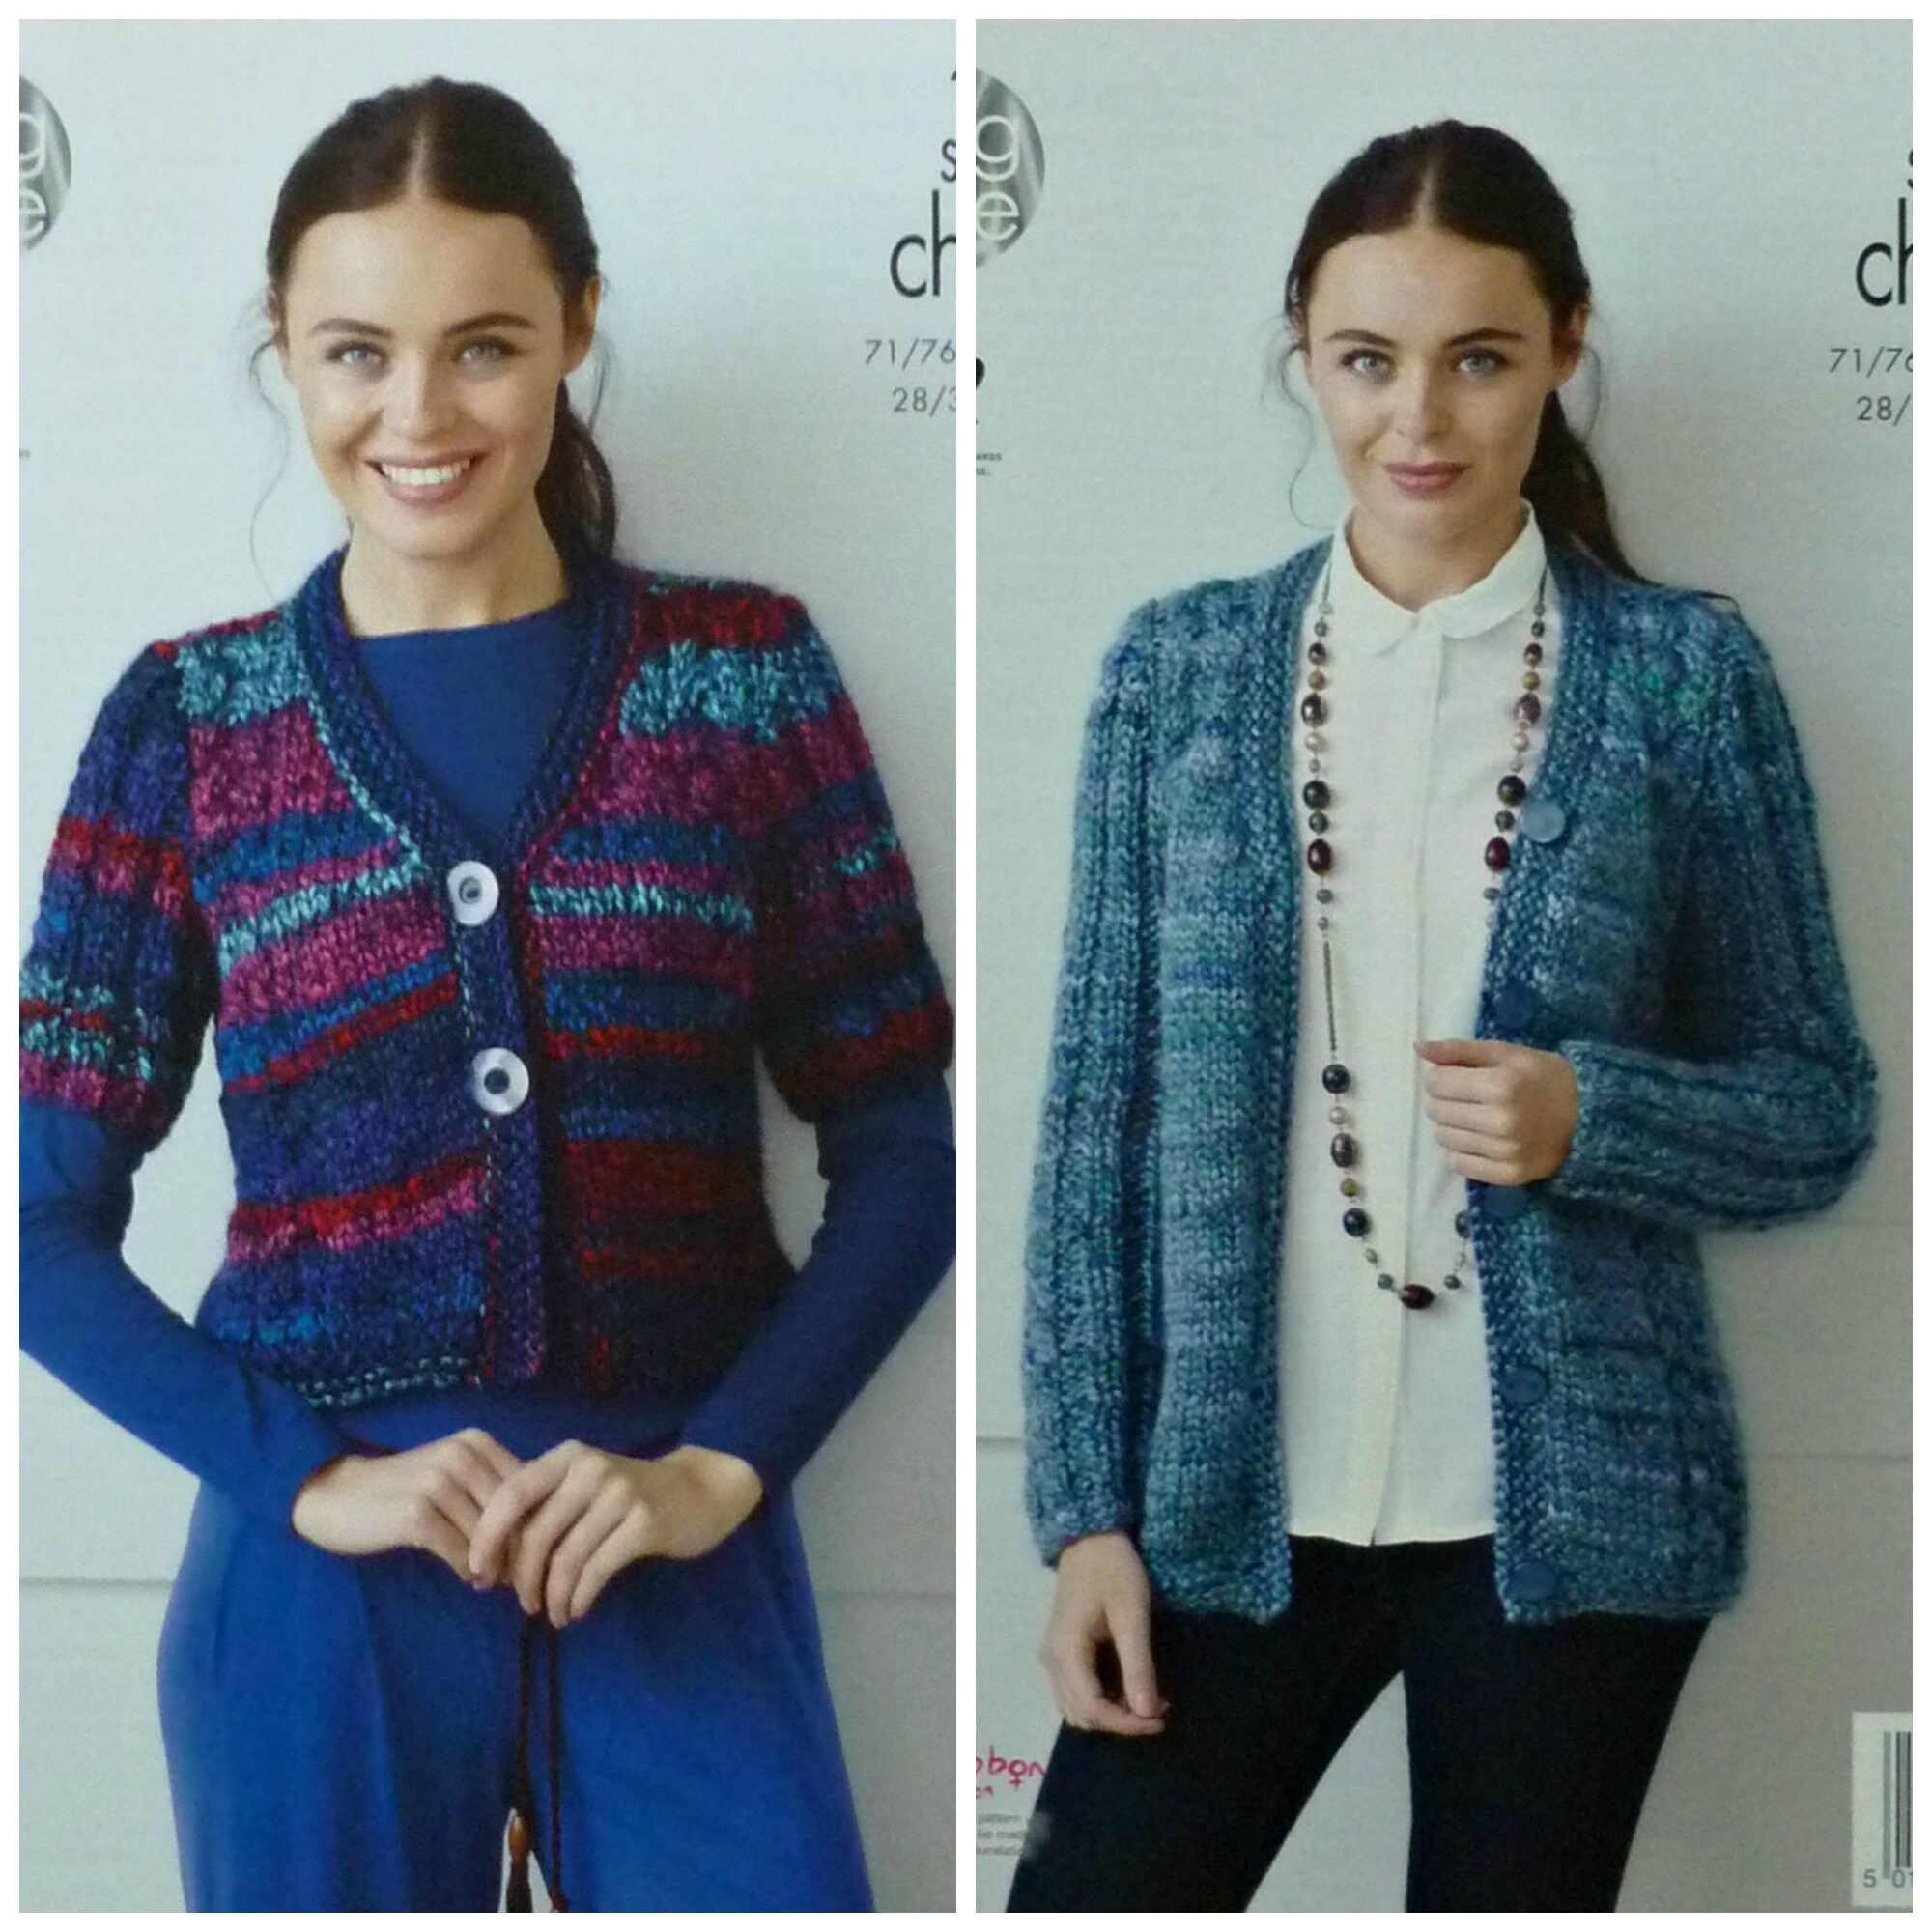 abcea7862 Womens Knitting Pattern K4356 Ladies Long or Short Sleeve V-Neck ...